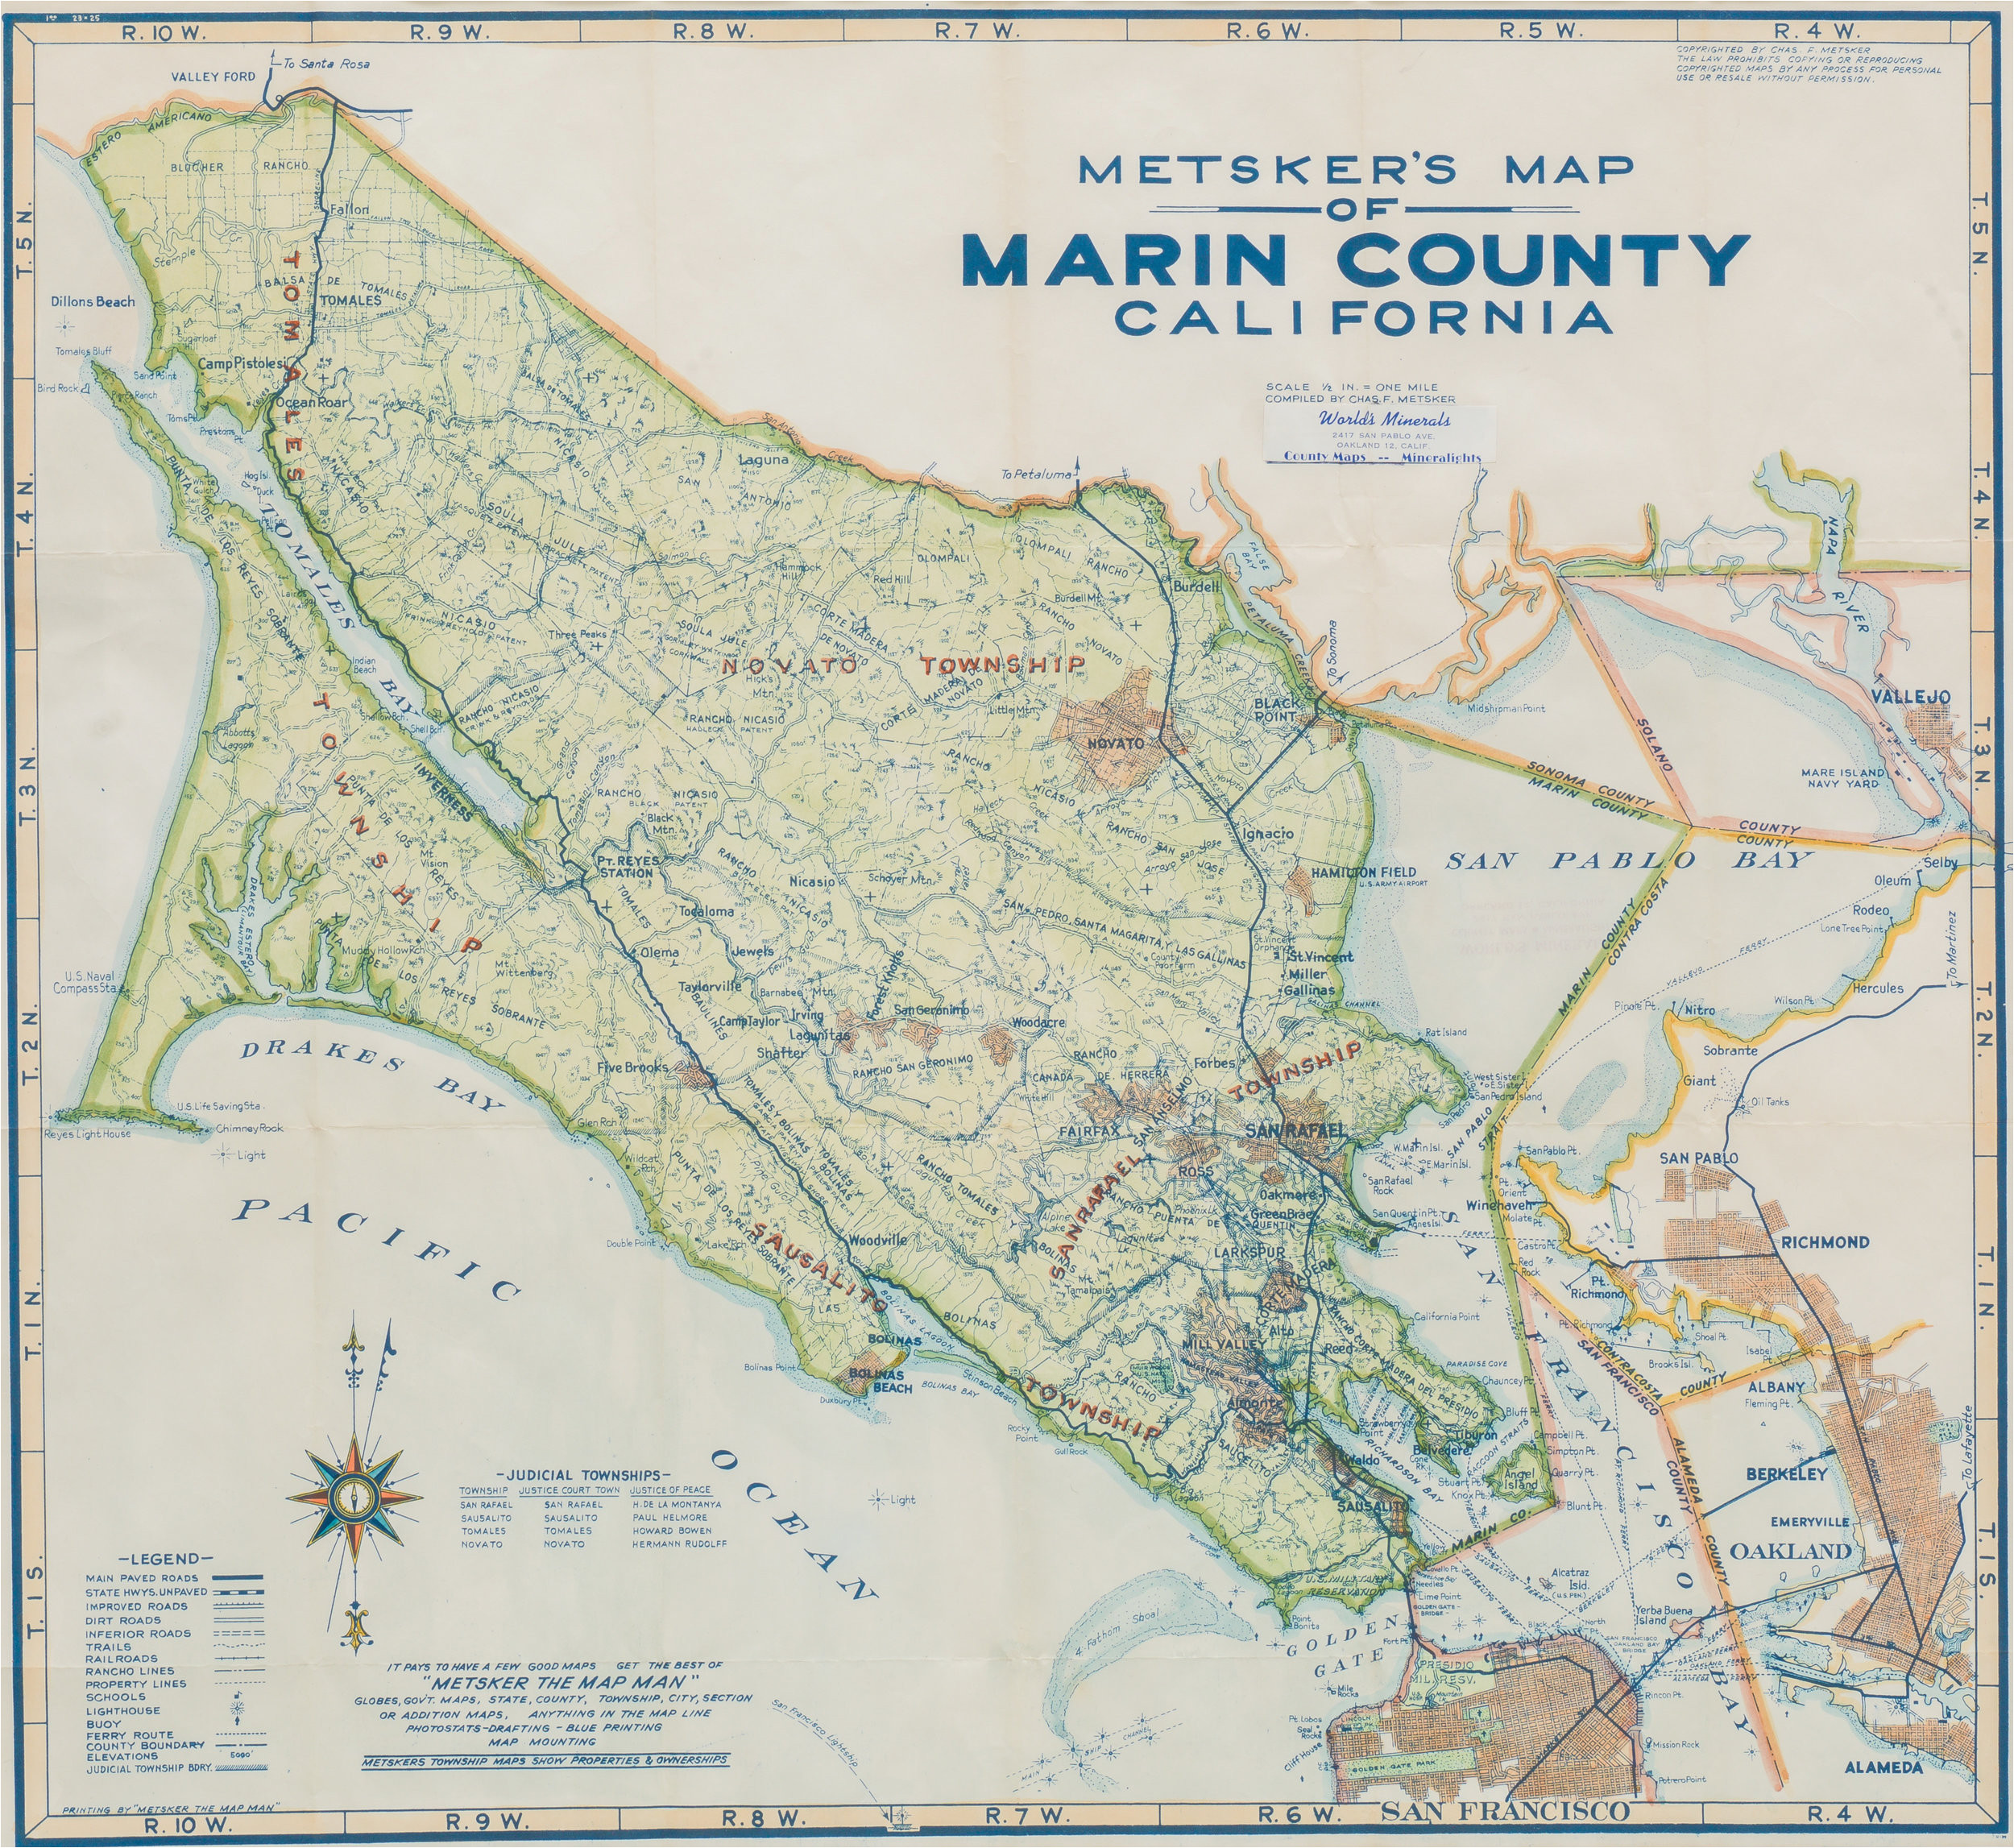 1948 metsker map of marin county california neatline antique maps